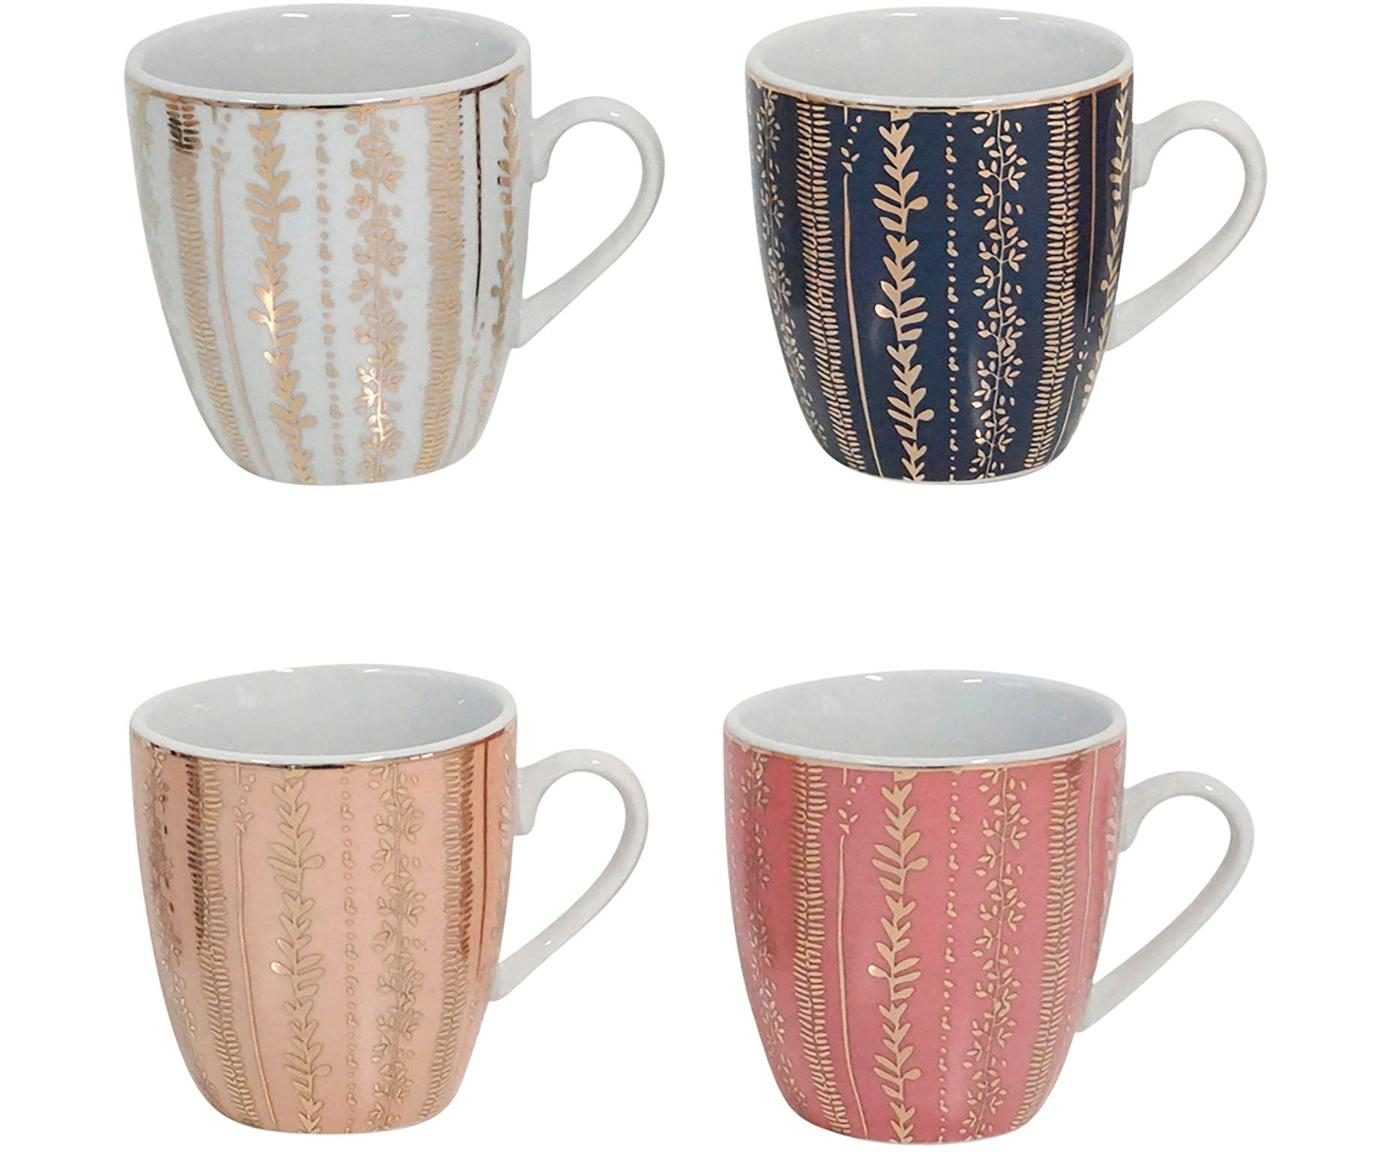 Set de tazas de café Veg-Gold, 4uds., Porcelana, Rosa, azul, Ø 7 x Al 8 cm